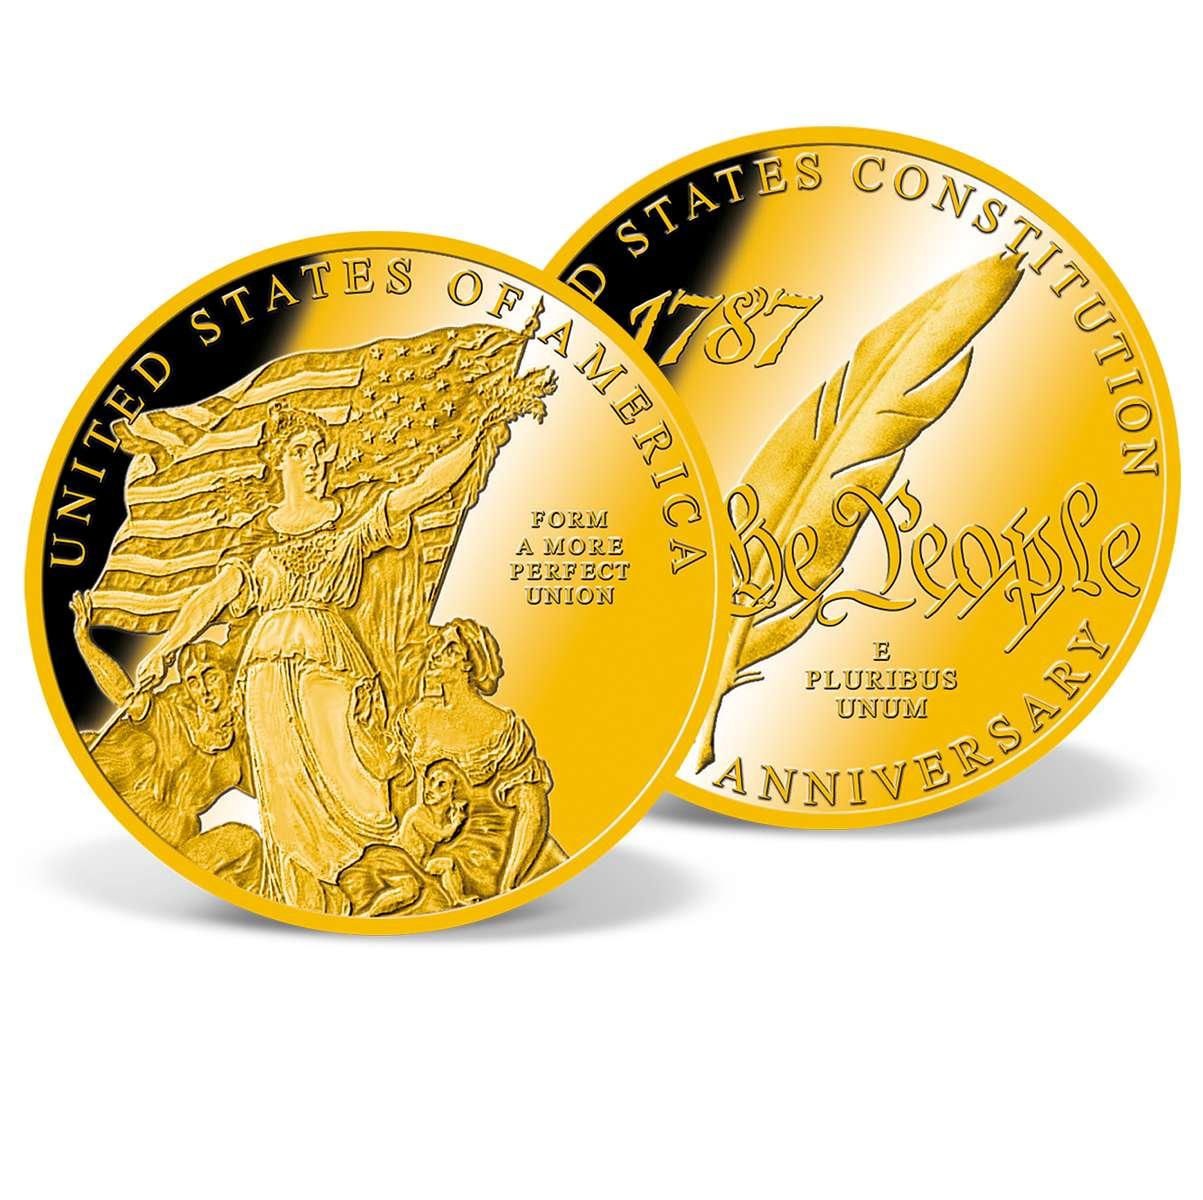 Form A More Perfect Union Commemorative Gold Coin